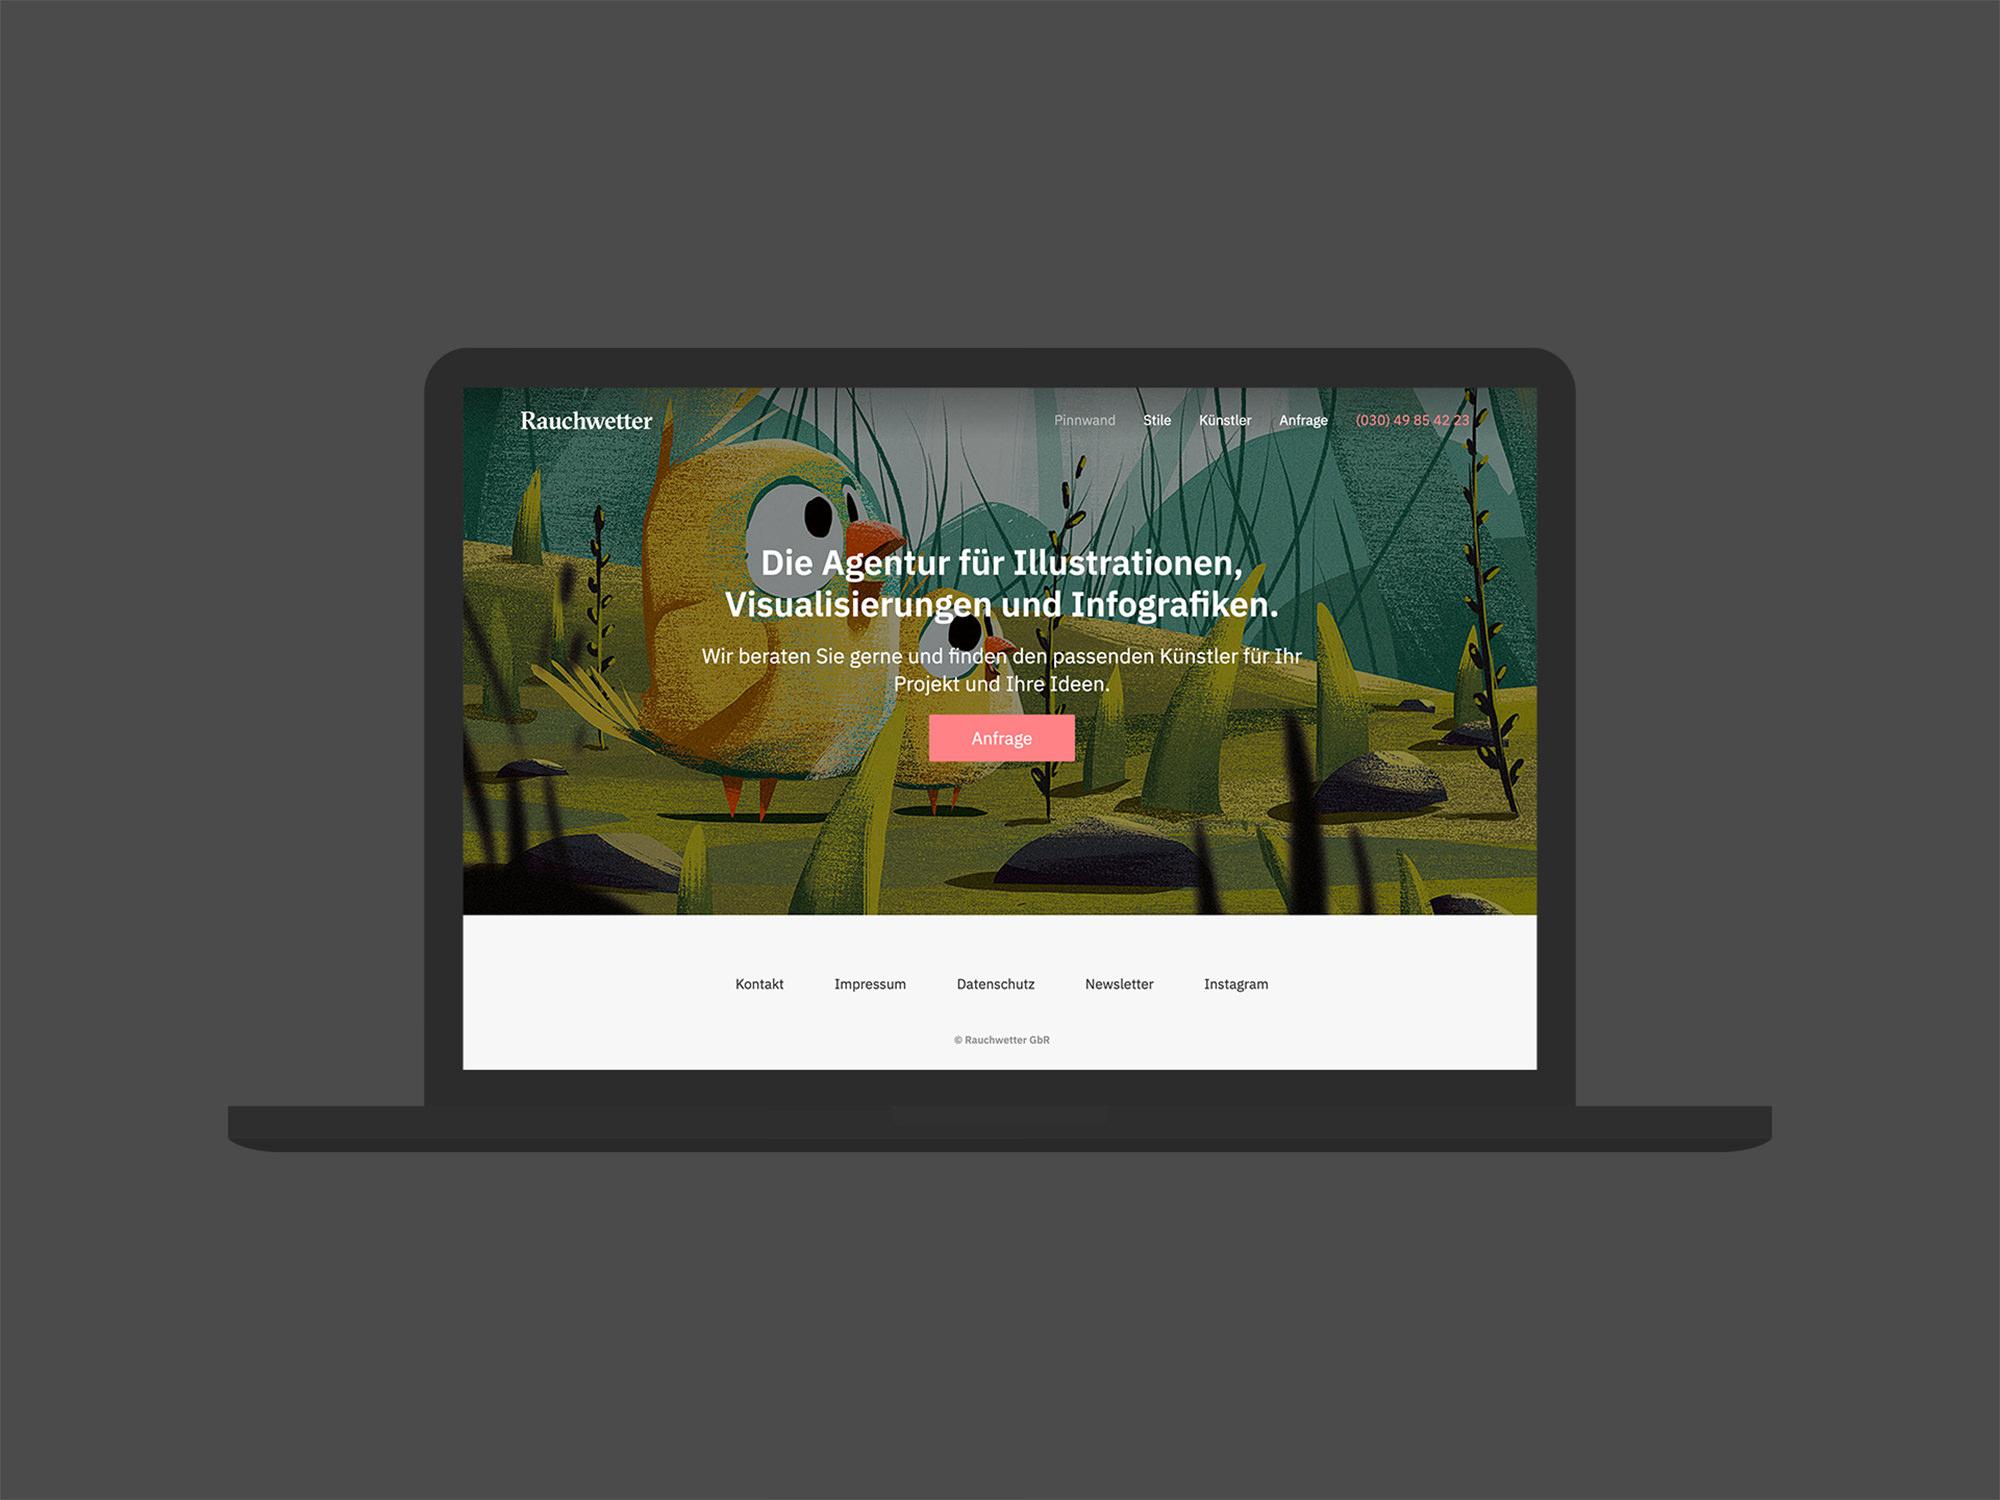 Web 01 (Rauchwetter, Corporate Design)